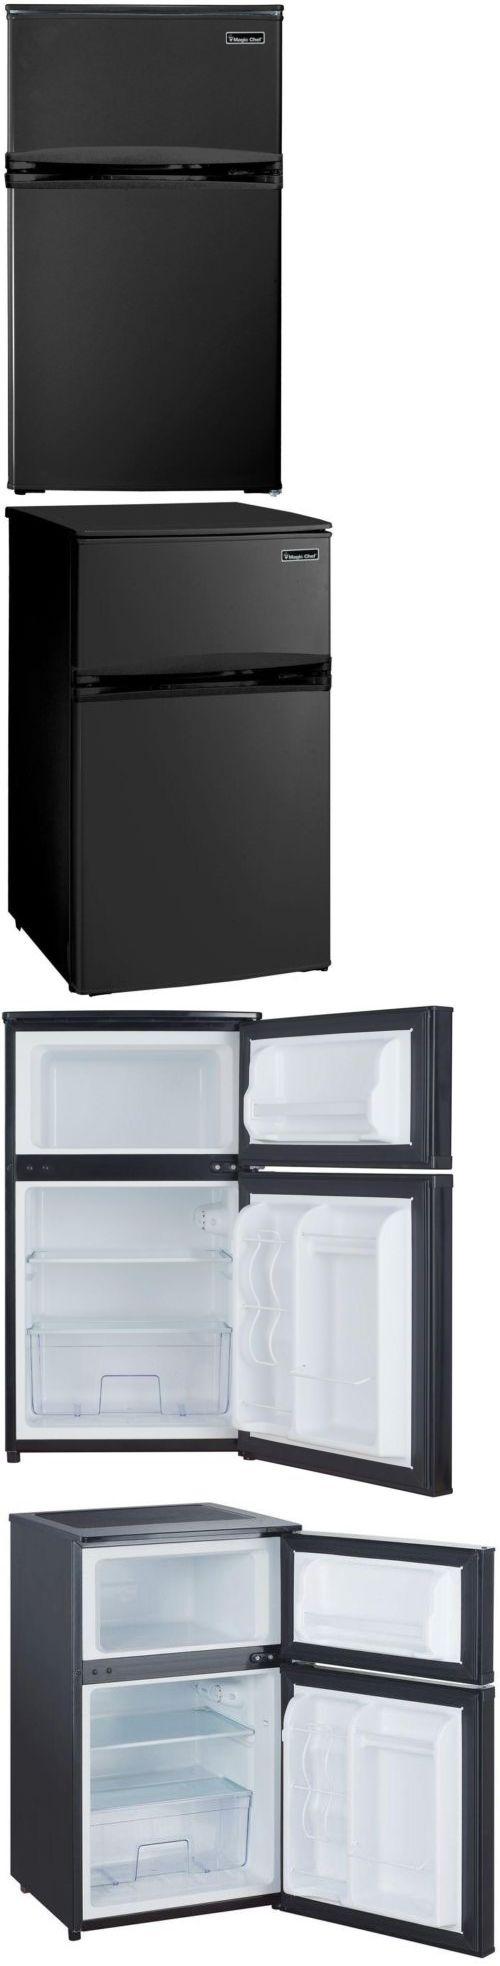 Mini Fridges 71262: Black Mini Refrigerator, Freezer, 3.1 Cu Ft, Compact Fridge, Office, Home, Dorm -> BUY IT NOW ONLY: $244.73 on eBay!